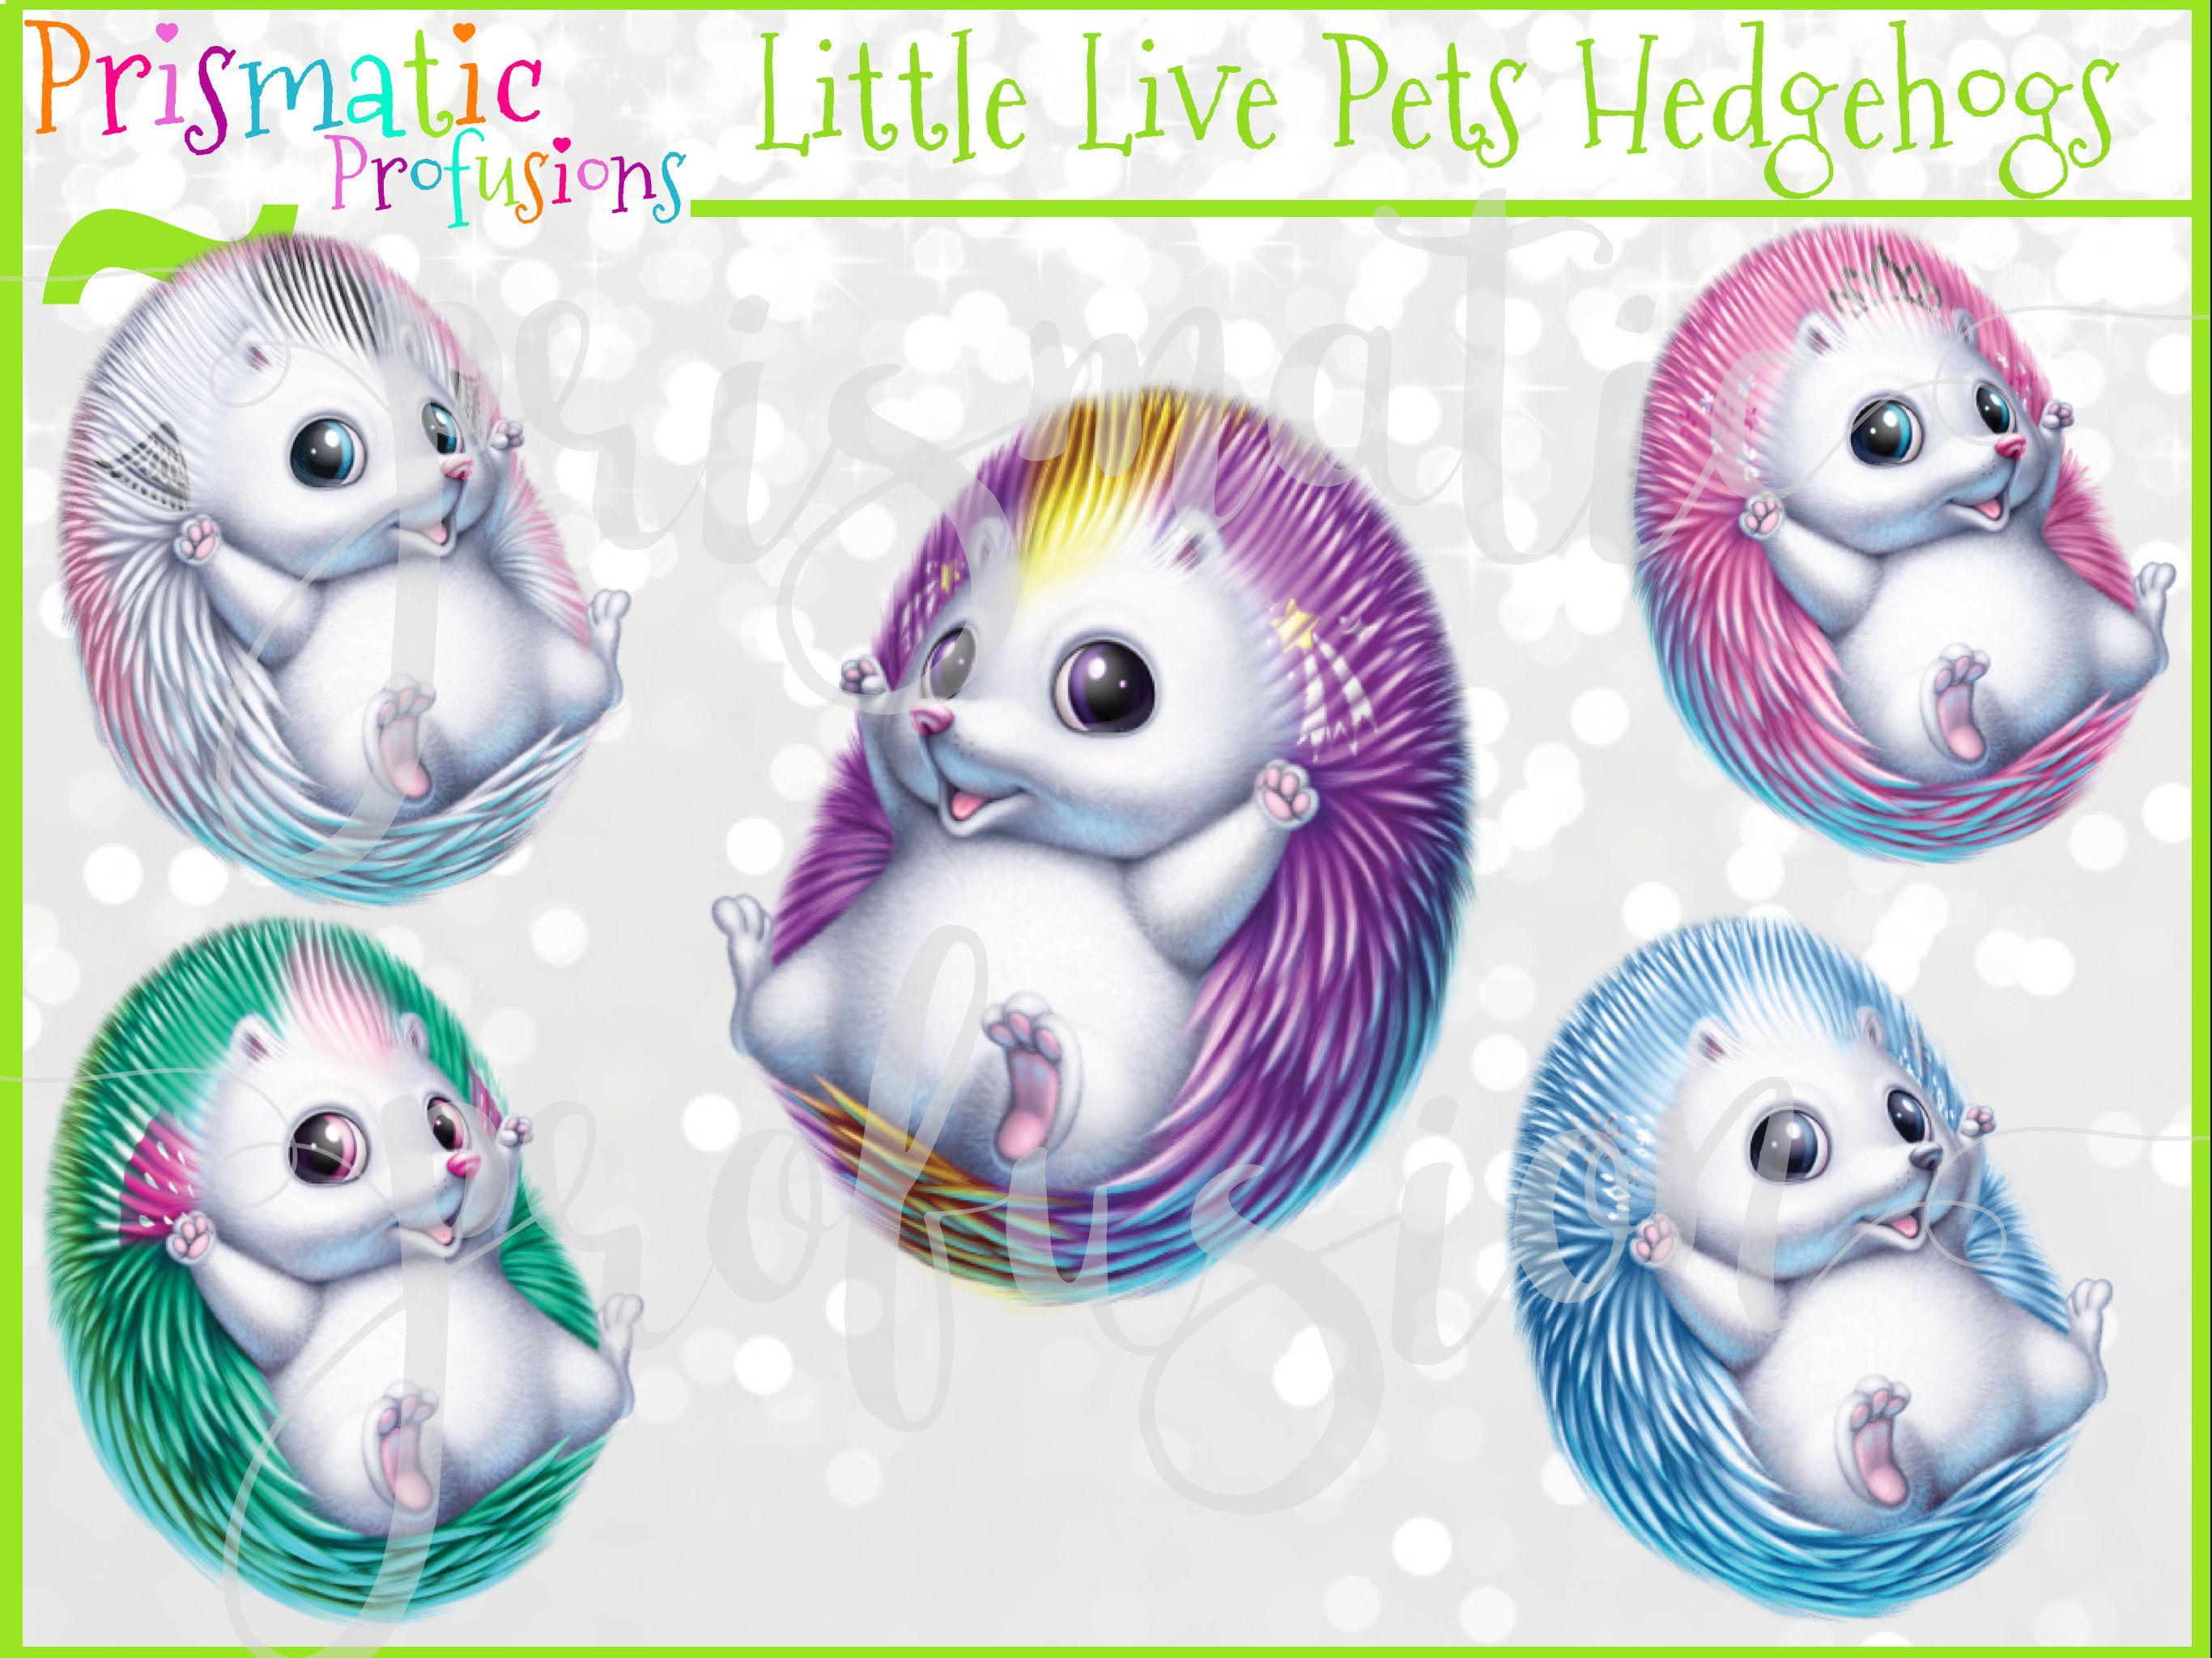 Little live pets hedgehogs image clipart diy modern printable lego svg lego birthday invitation lego minifigures lego party lego invitation lego birthday lego emmet policeman scientist stopboris Gallery